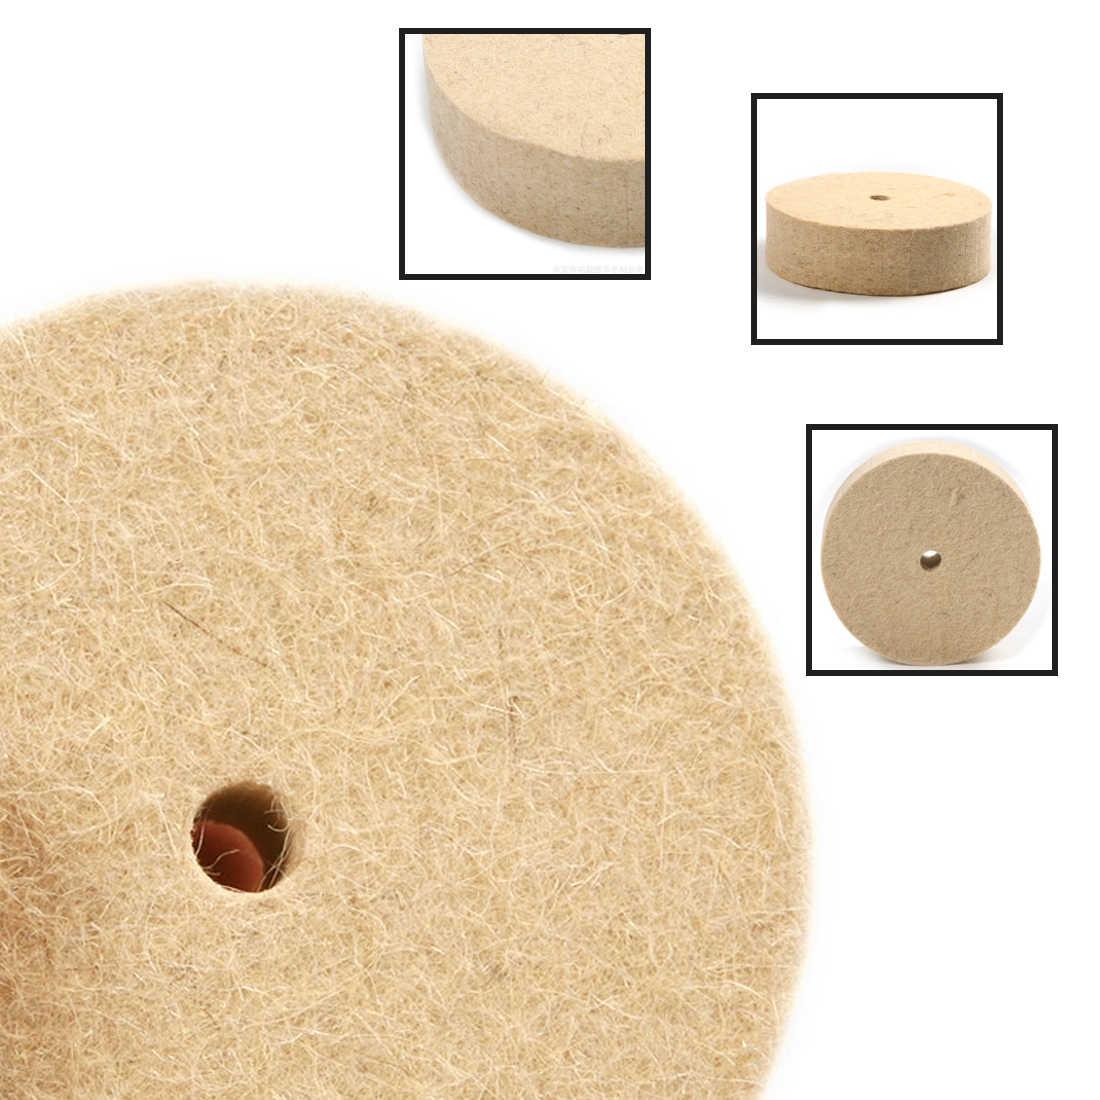 ZUZZEE 3 Inch Buffing Grinding Wheel Wool Felt Polishing Abrasive Disc For Metal Surface